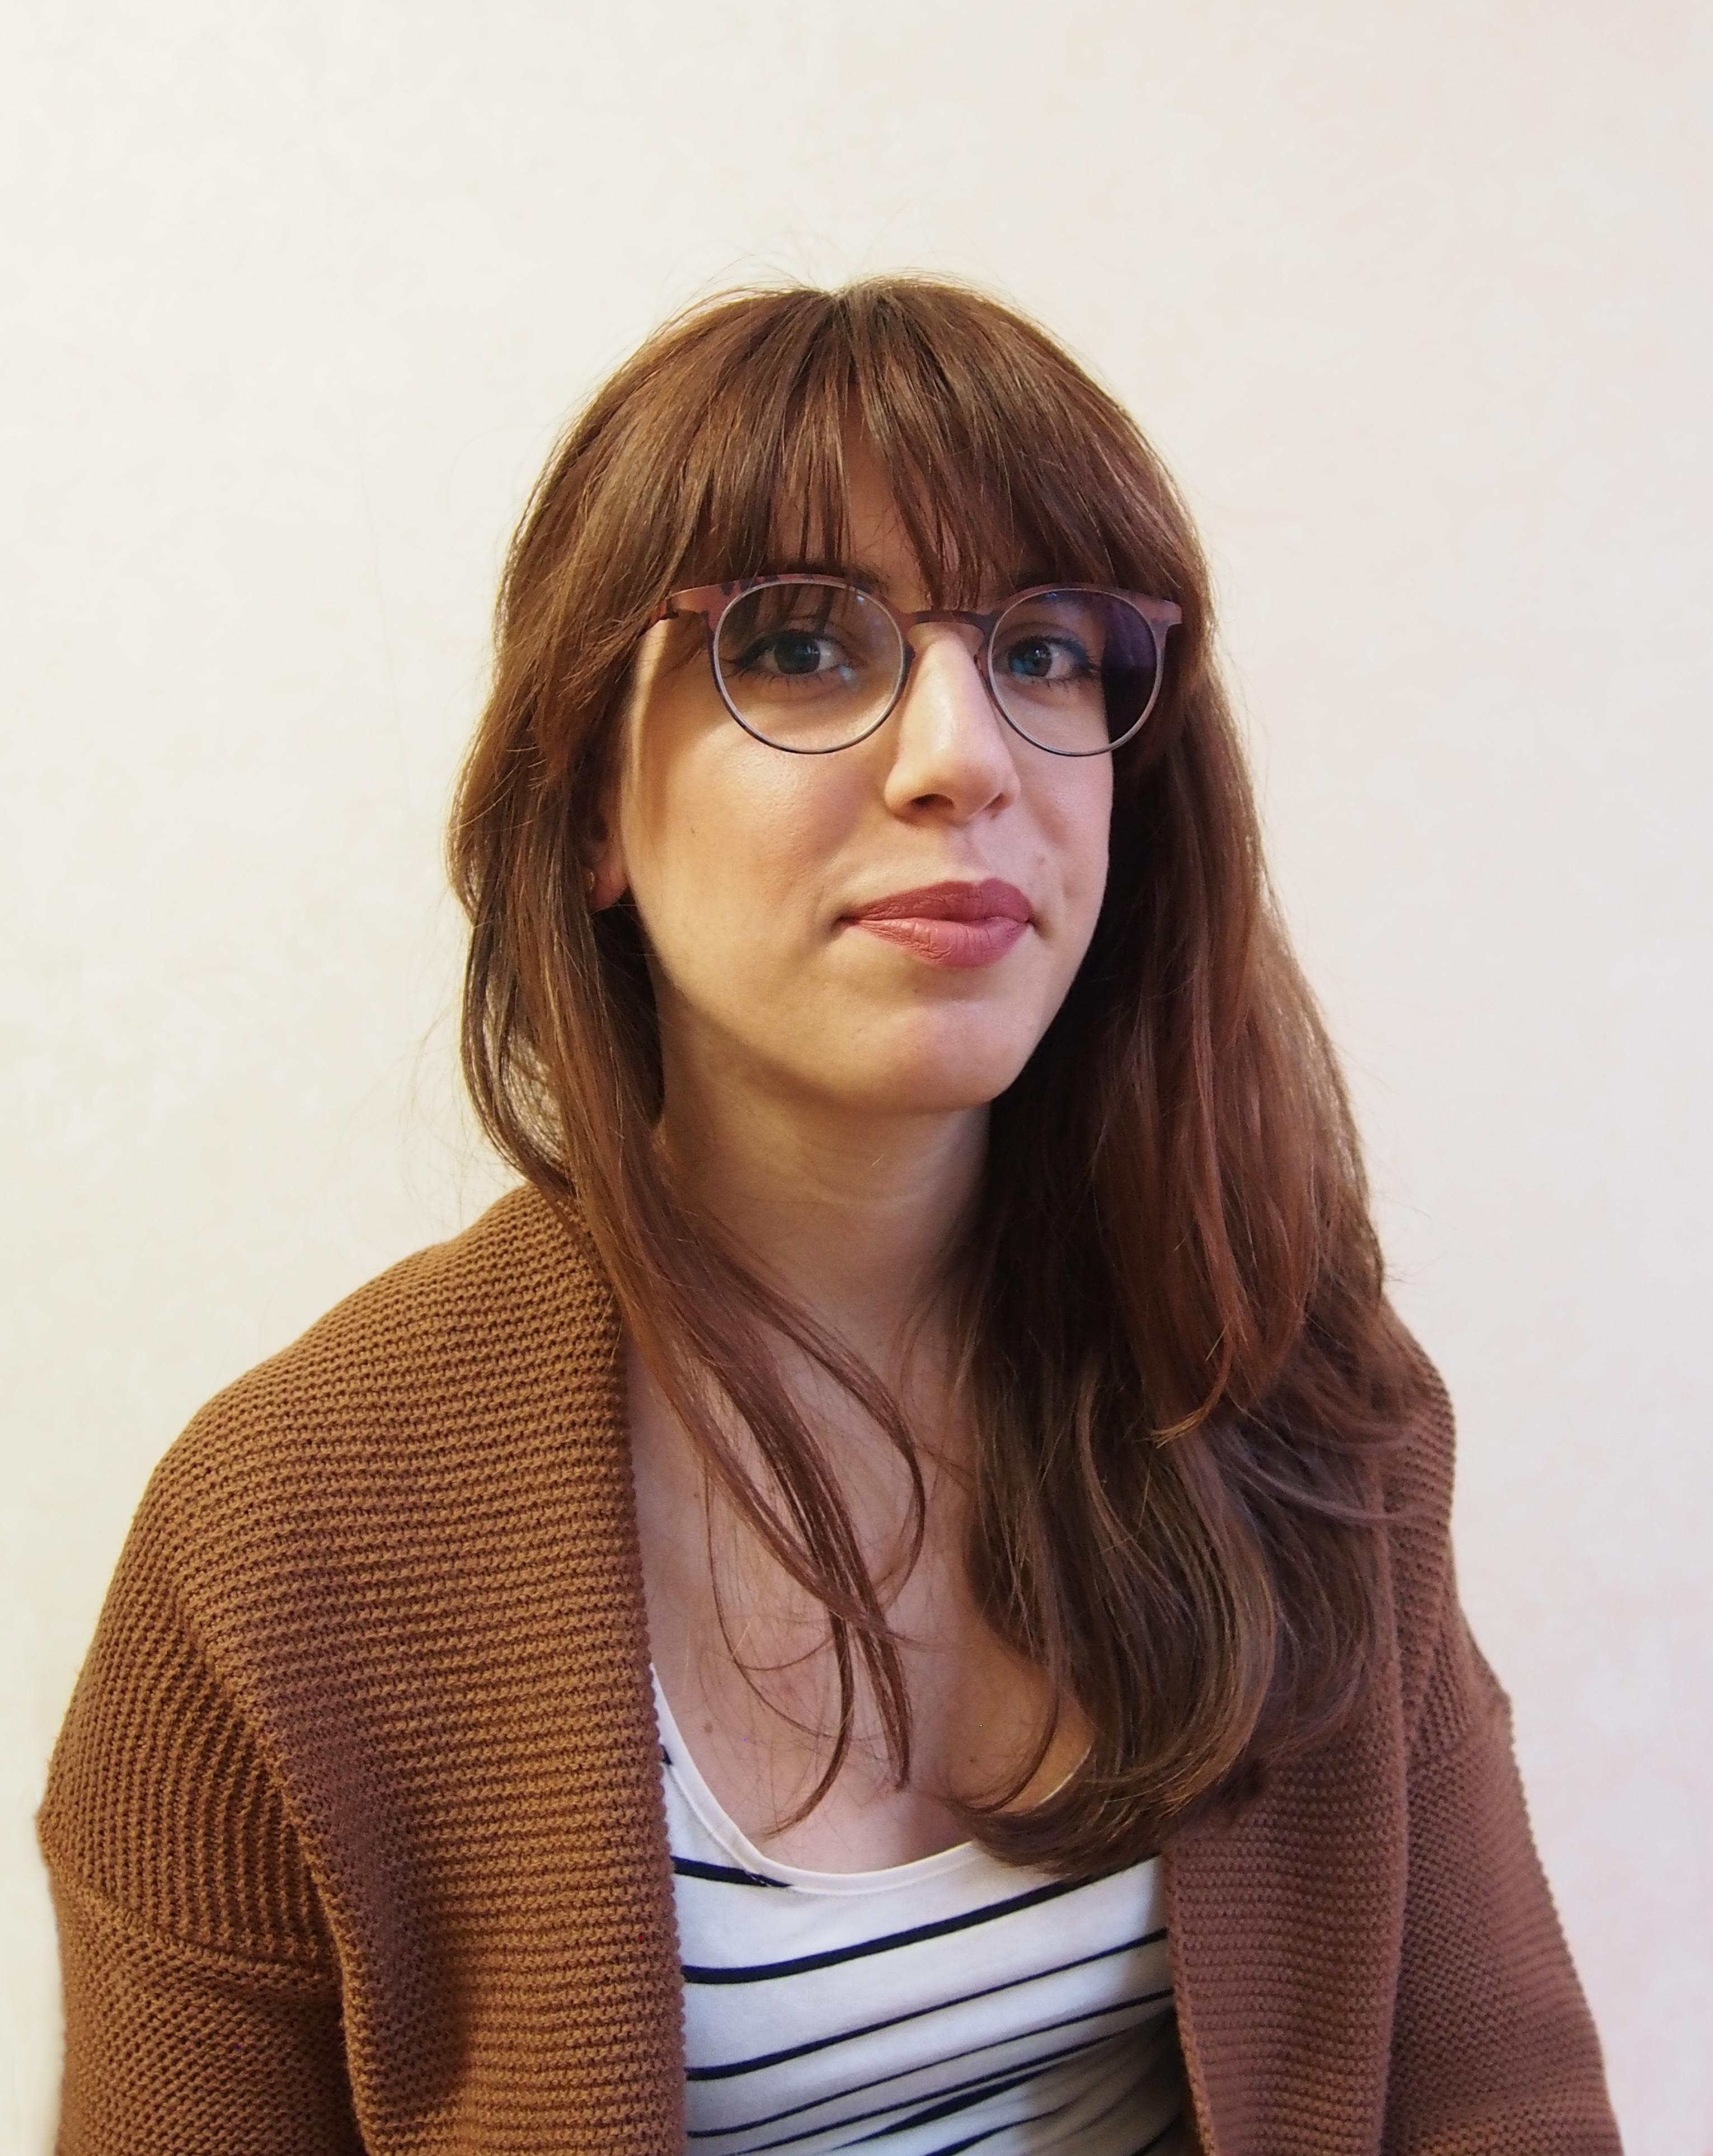 Maria Luisa Di Gravio